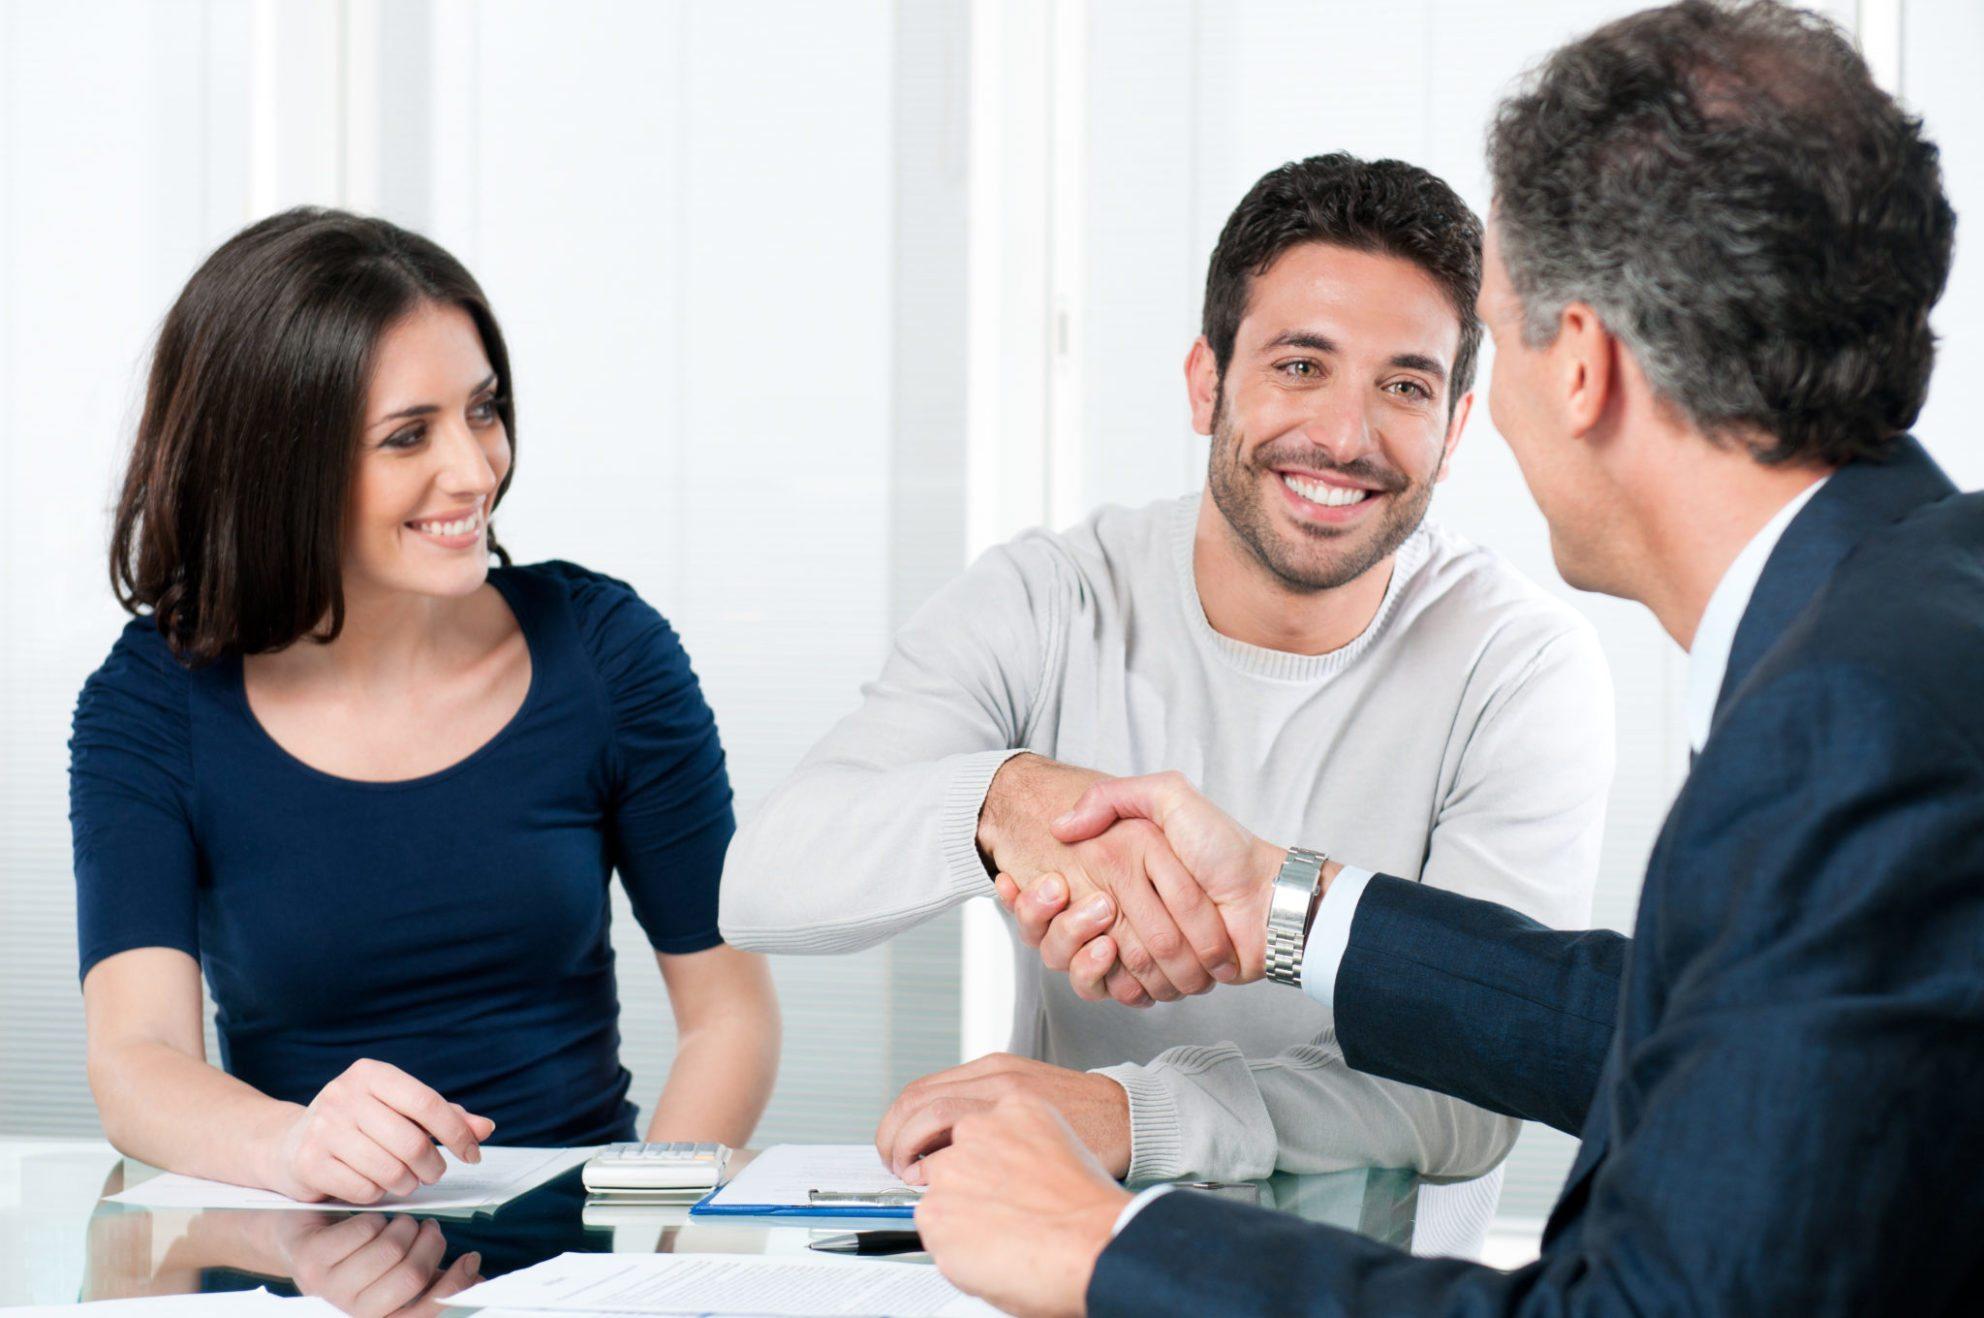 Broker as investor: a new business model?